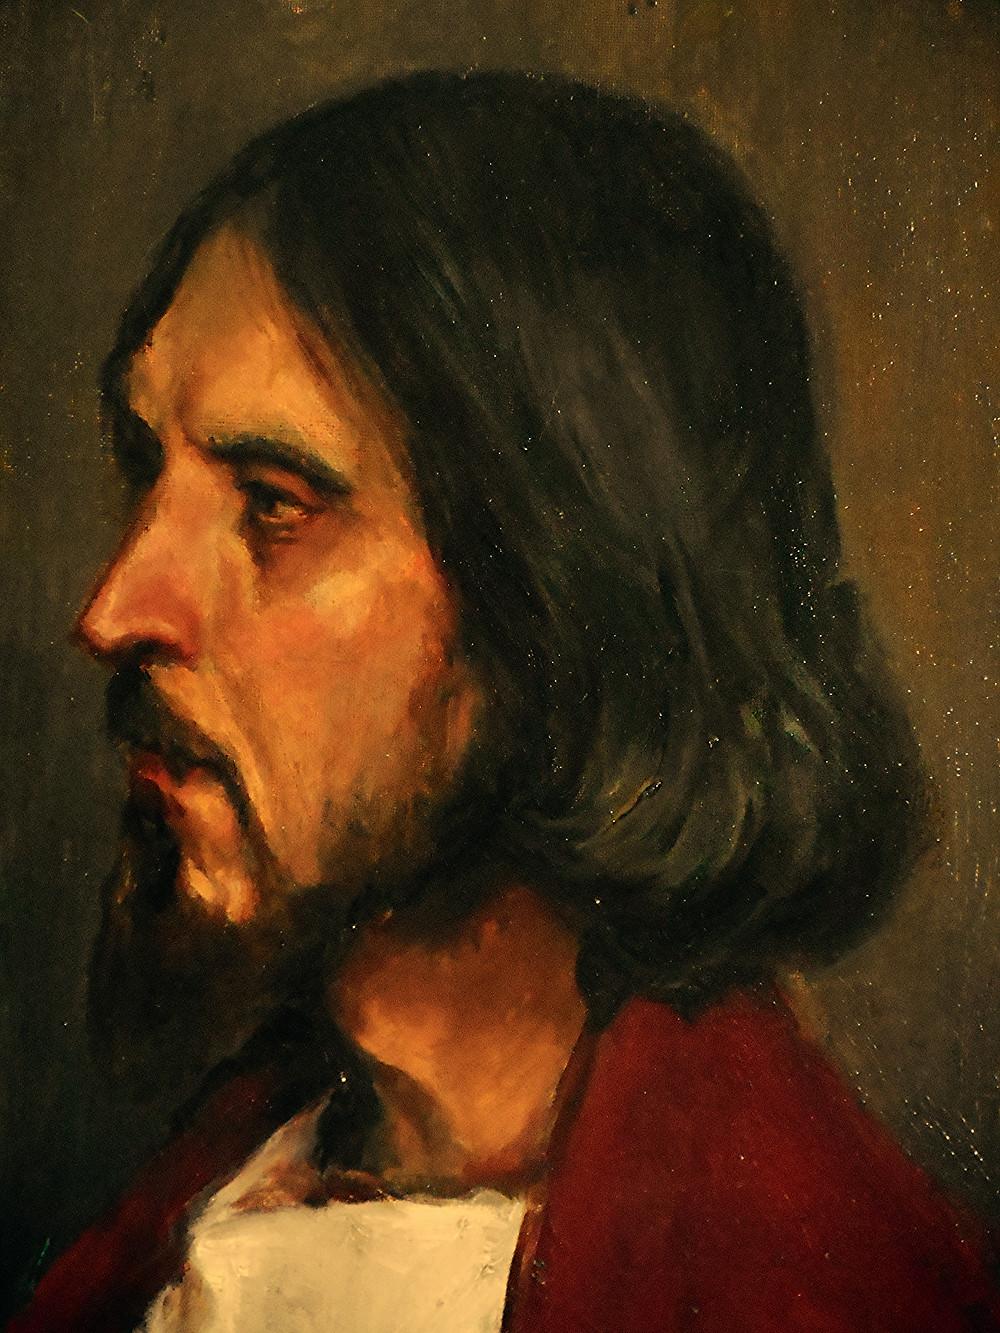 Elias' Proverbs, Daniel Molyneux, Ilya Repin, The Angel of Antioch, Russian, Jesus Christ, poetry, Christianity, fiction, Amazon, Faith, Religion,